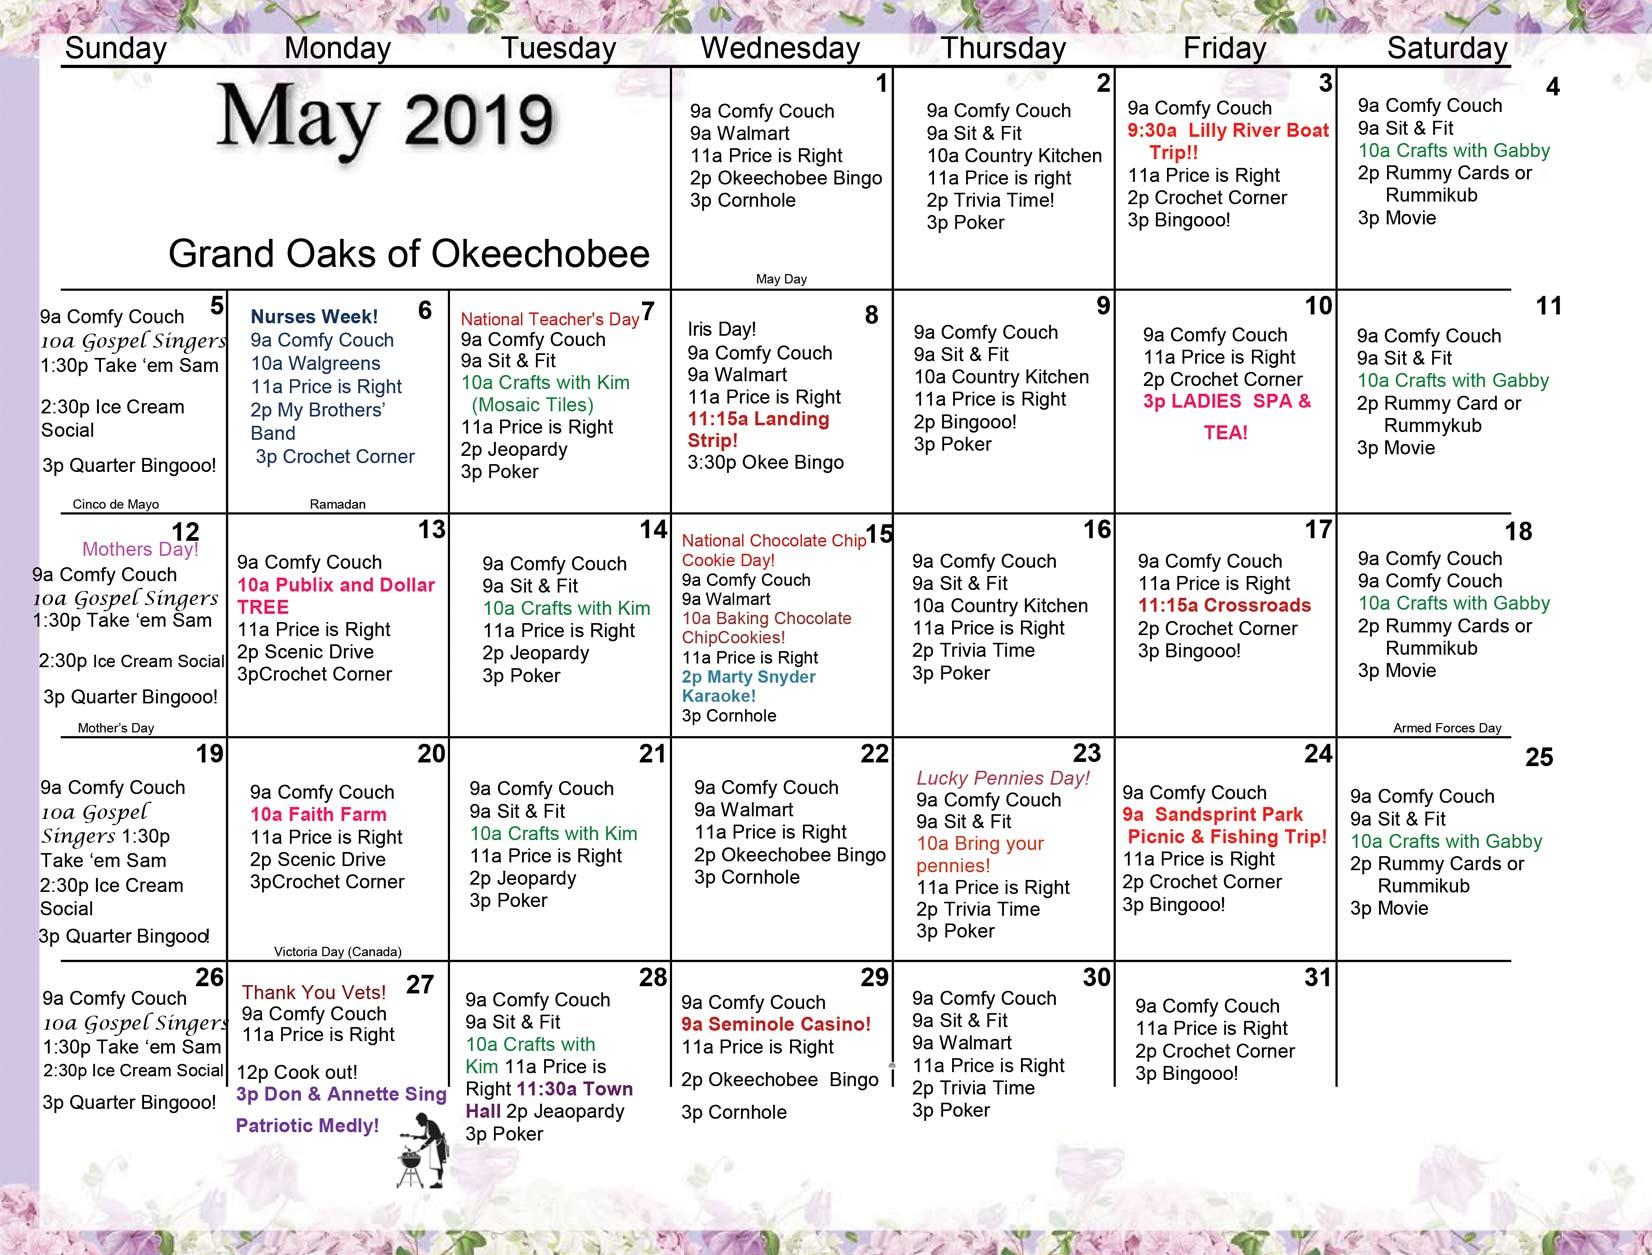 Grand Oaks Okeechobee Calendar May 2019